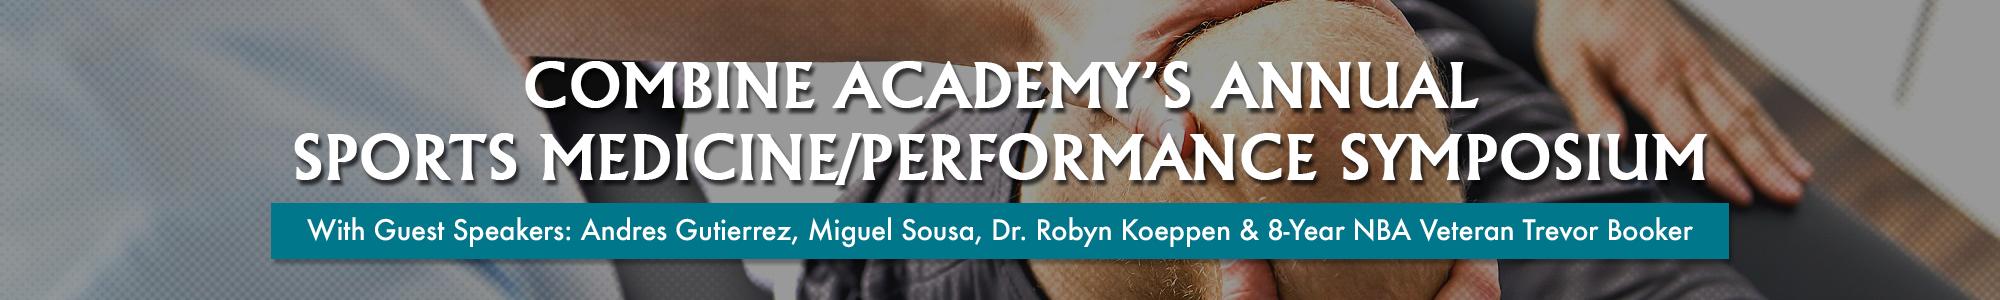 Sports Medicine Performance Symposium Banner